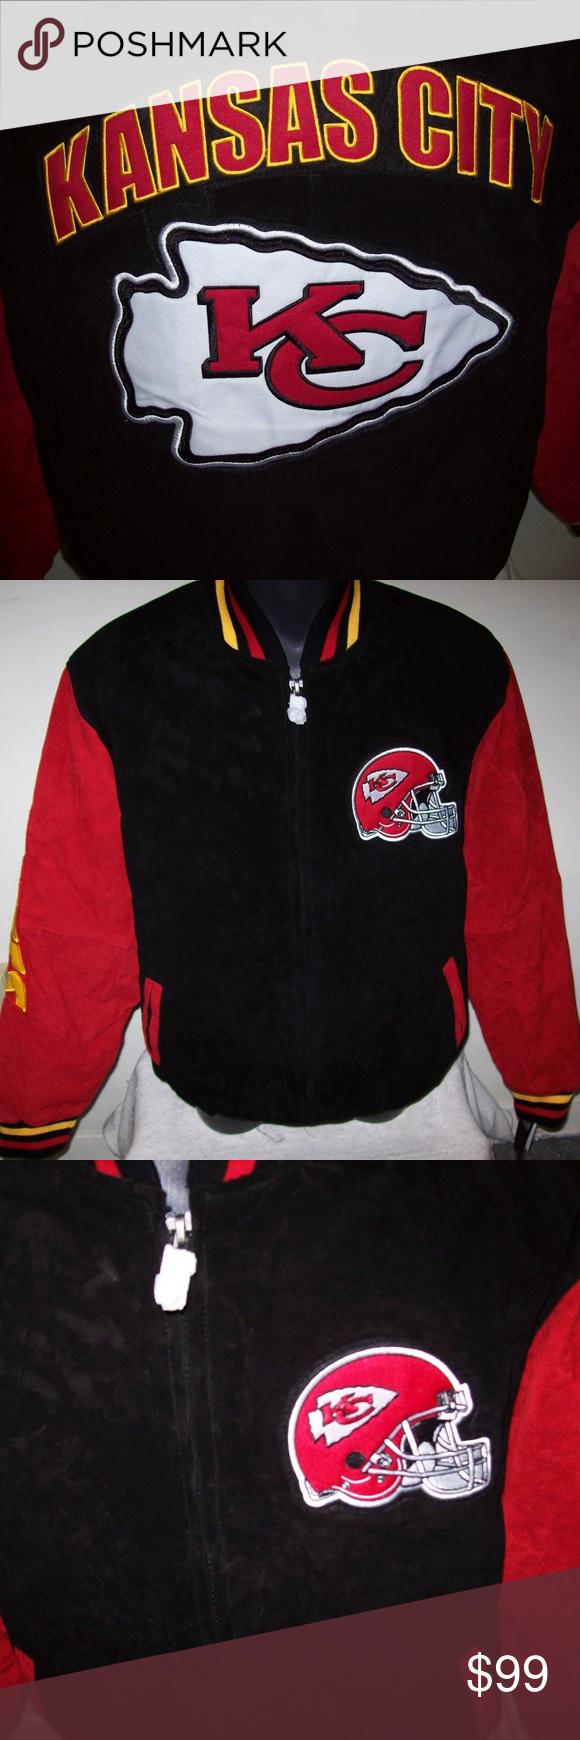 Kansas City Chiefs Nfl Suede Jacket Large Suede Jacket Nfl Kansas City Chiefs Jackets [ 1740 x 580 Pixel ]